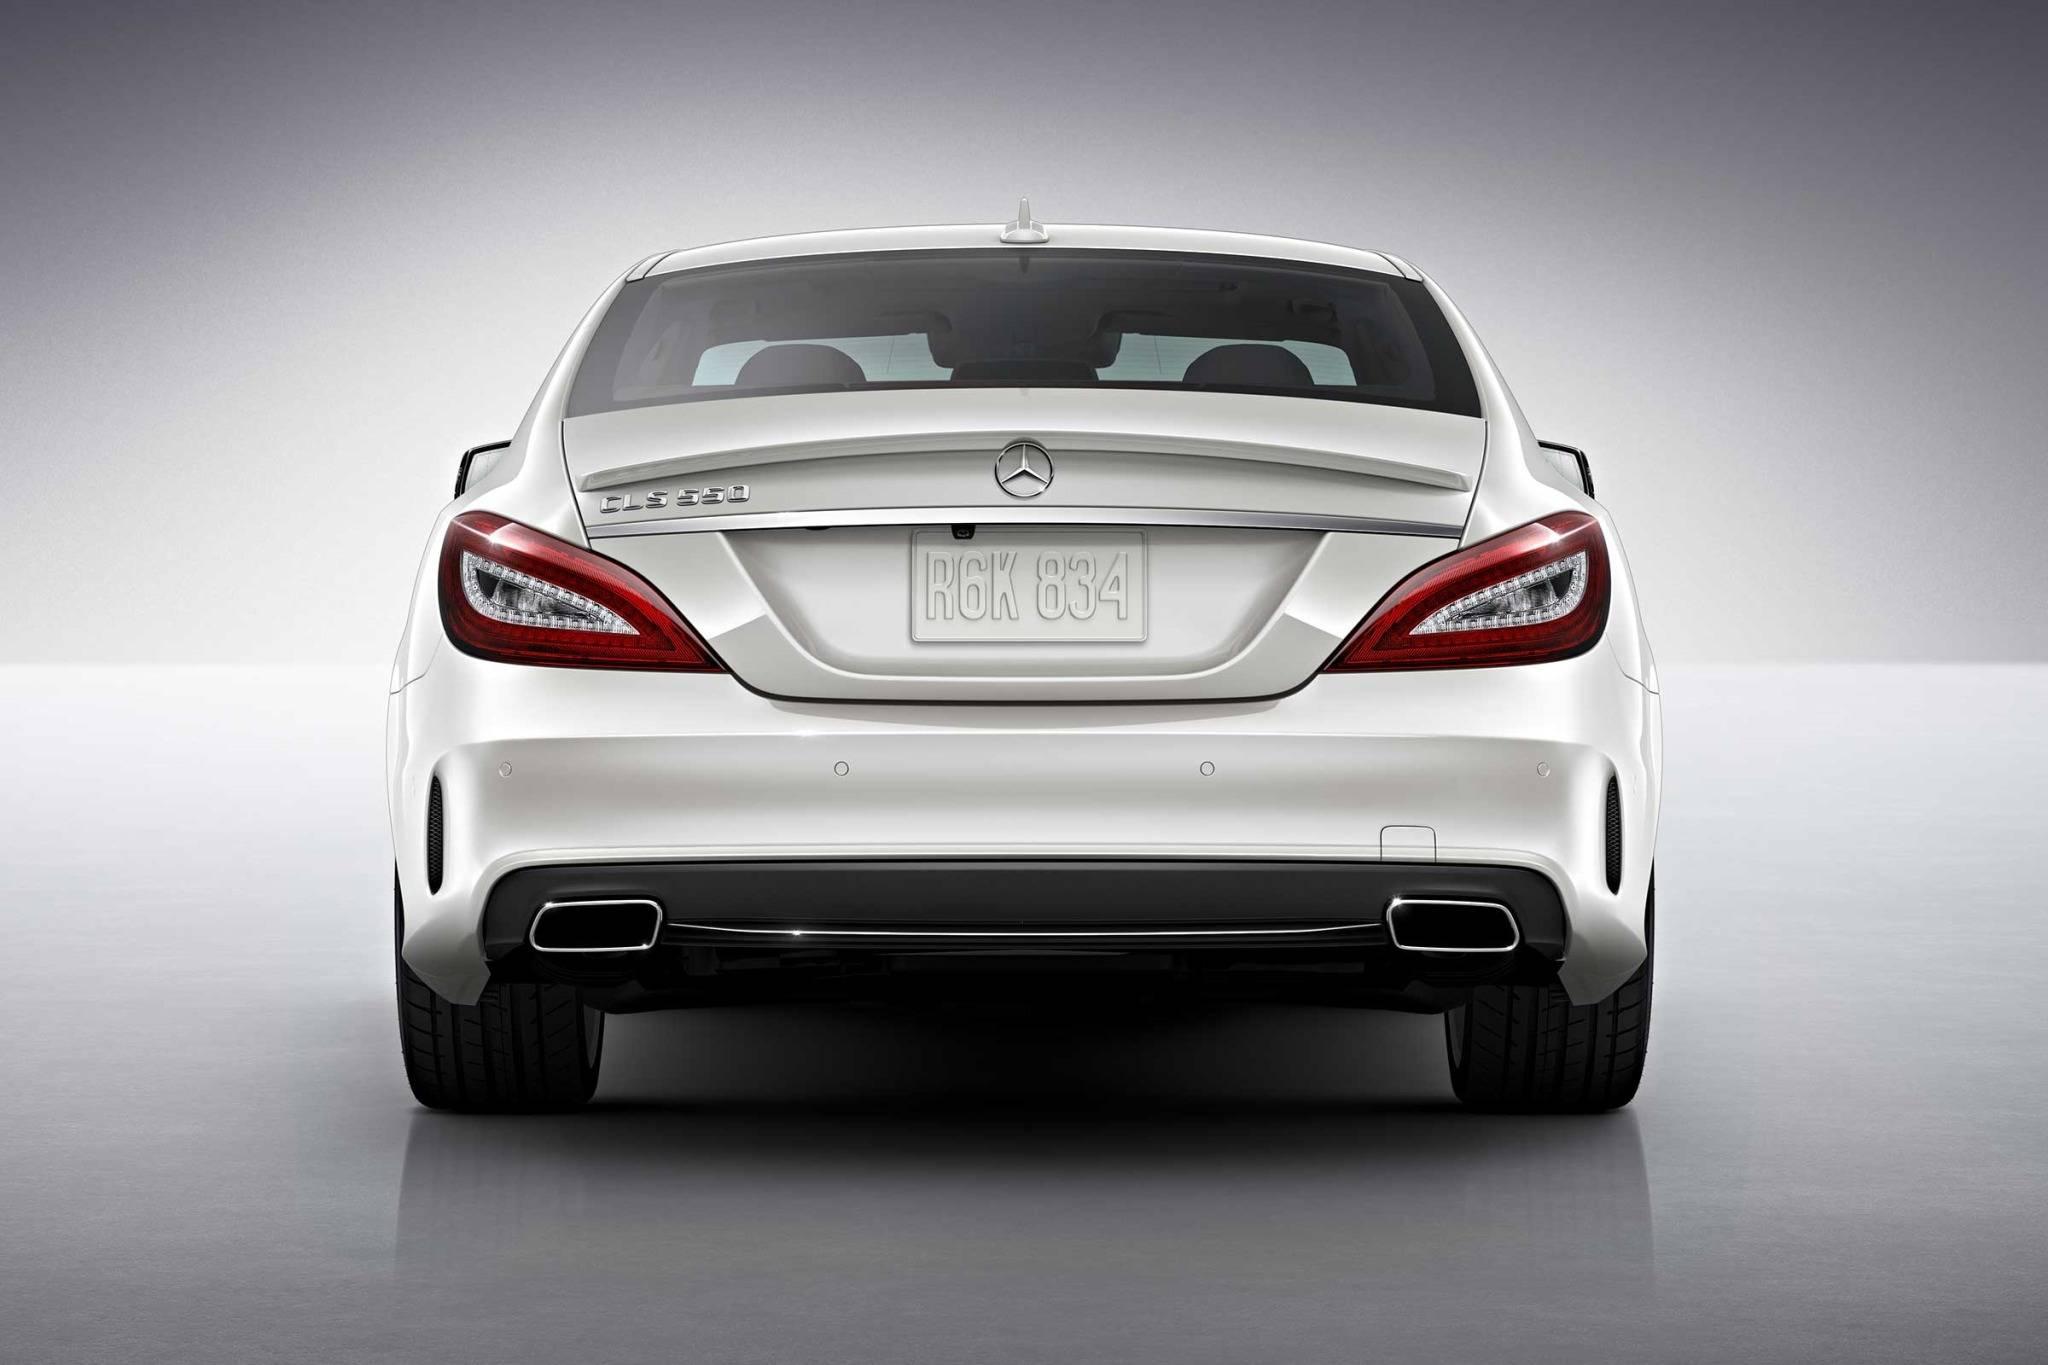 2017 Mercedes-Benz CLS-Class VIN Number Search - AutoDetective